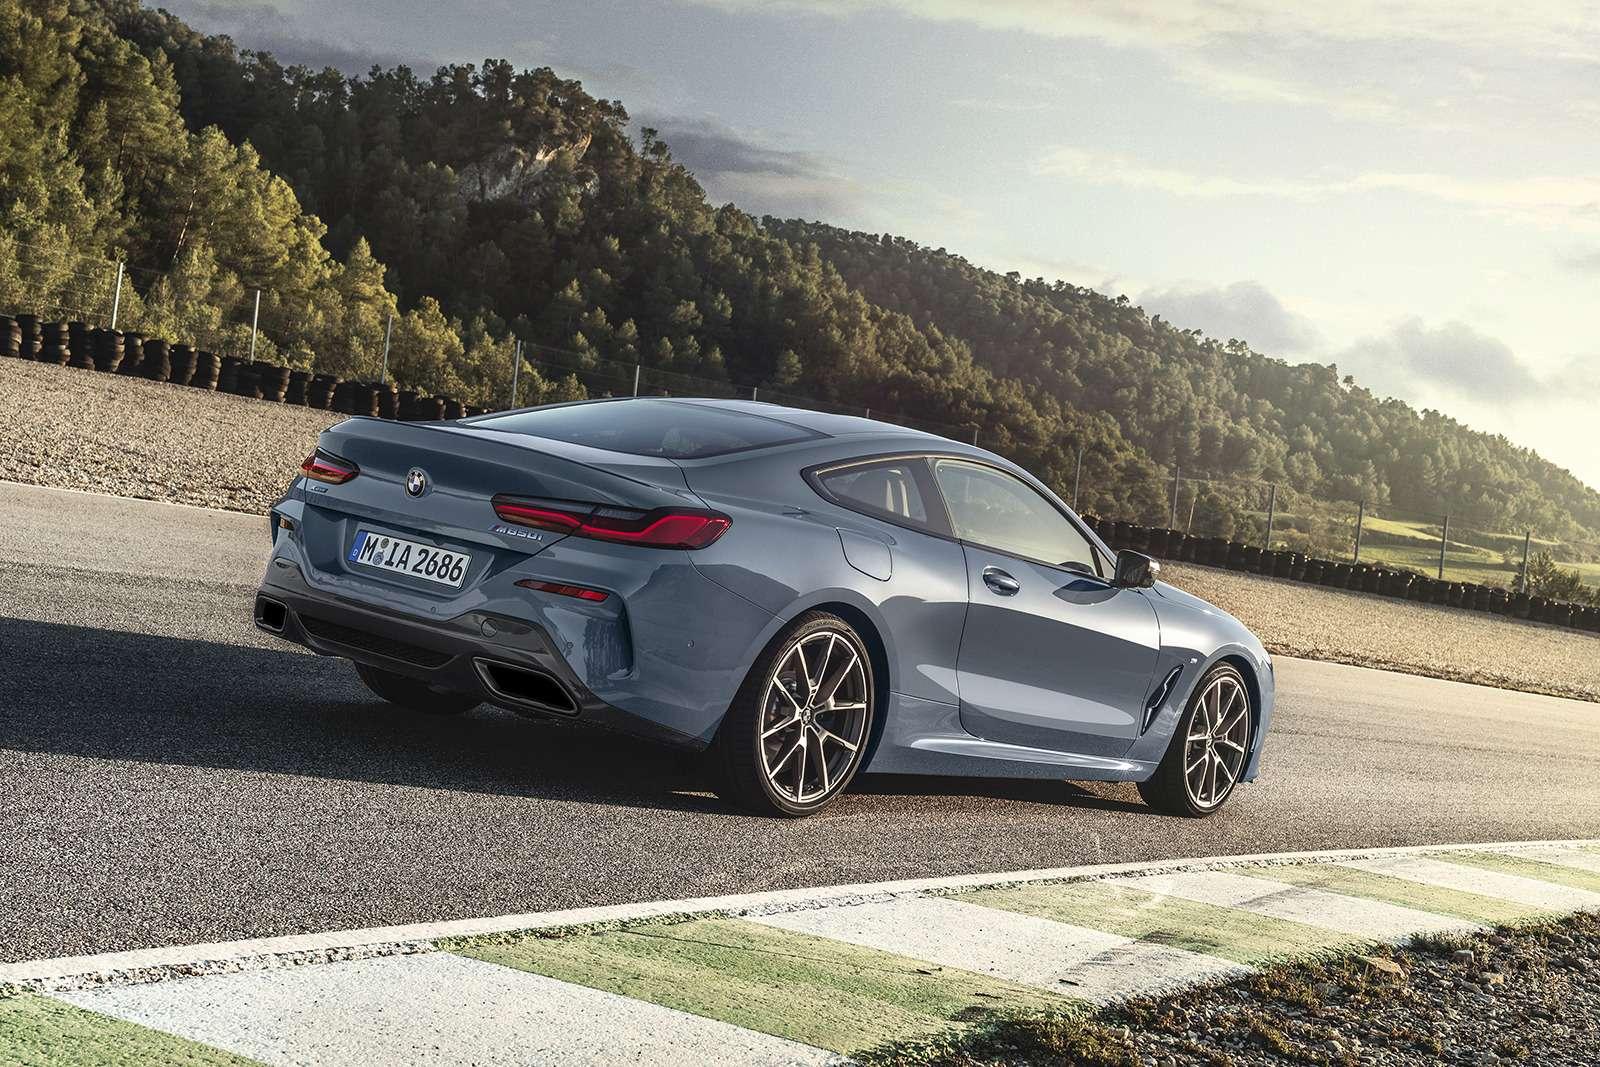 BMW8-й серии. 20лет спустя (почти)— фото 879663